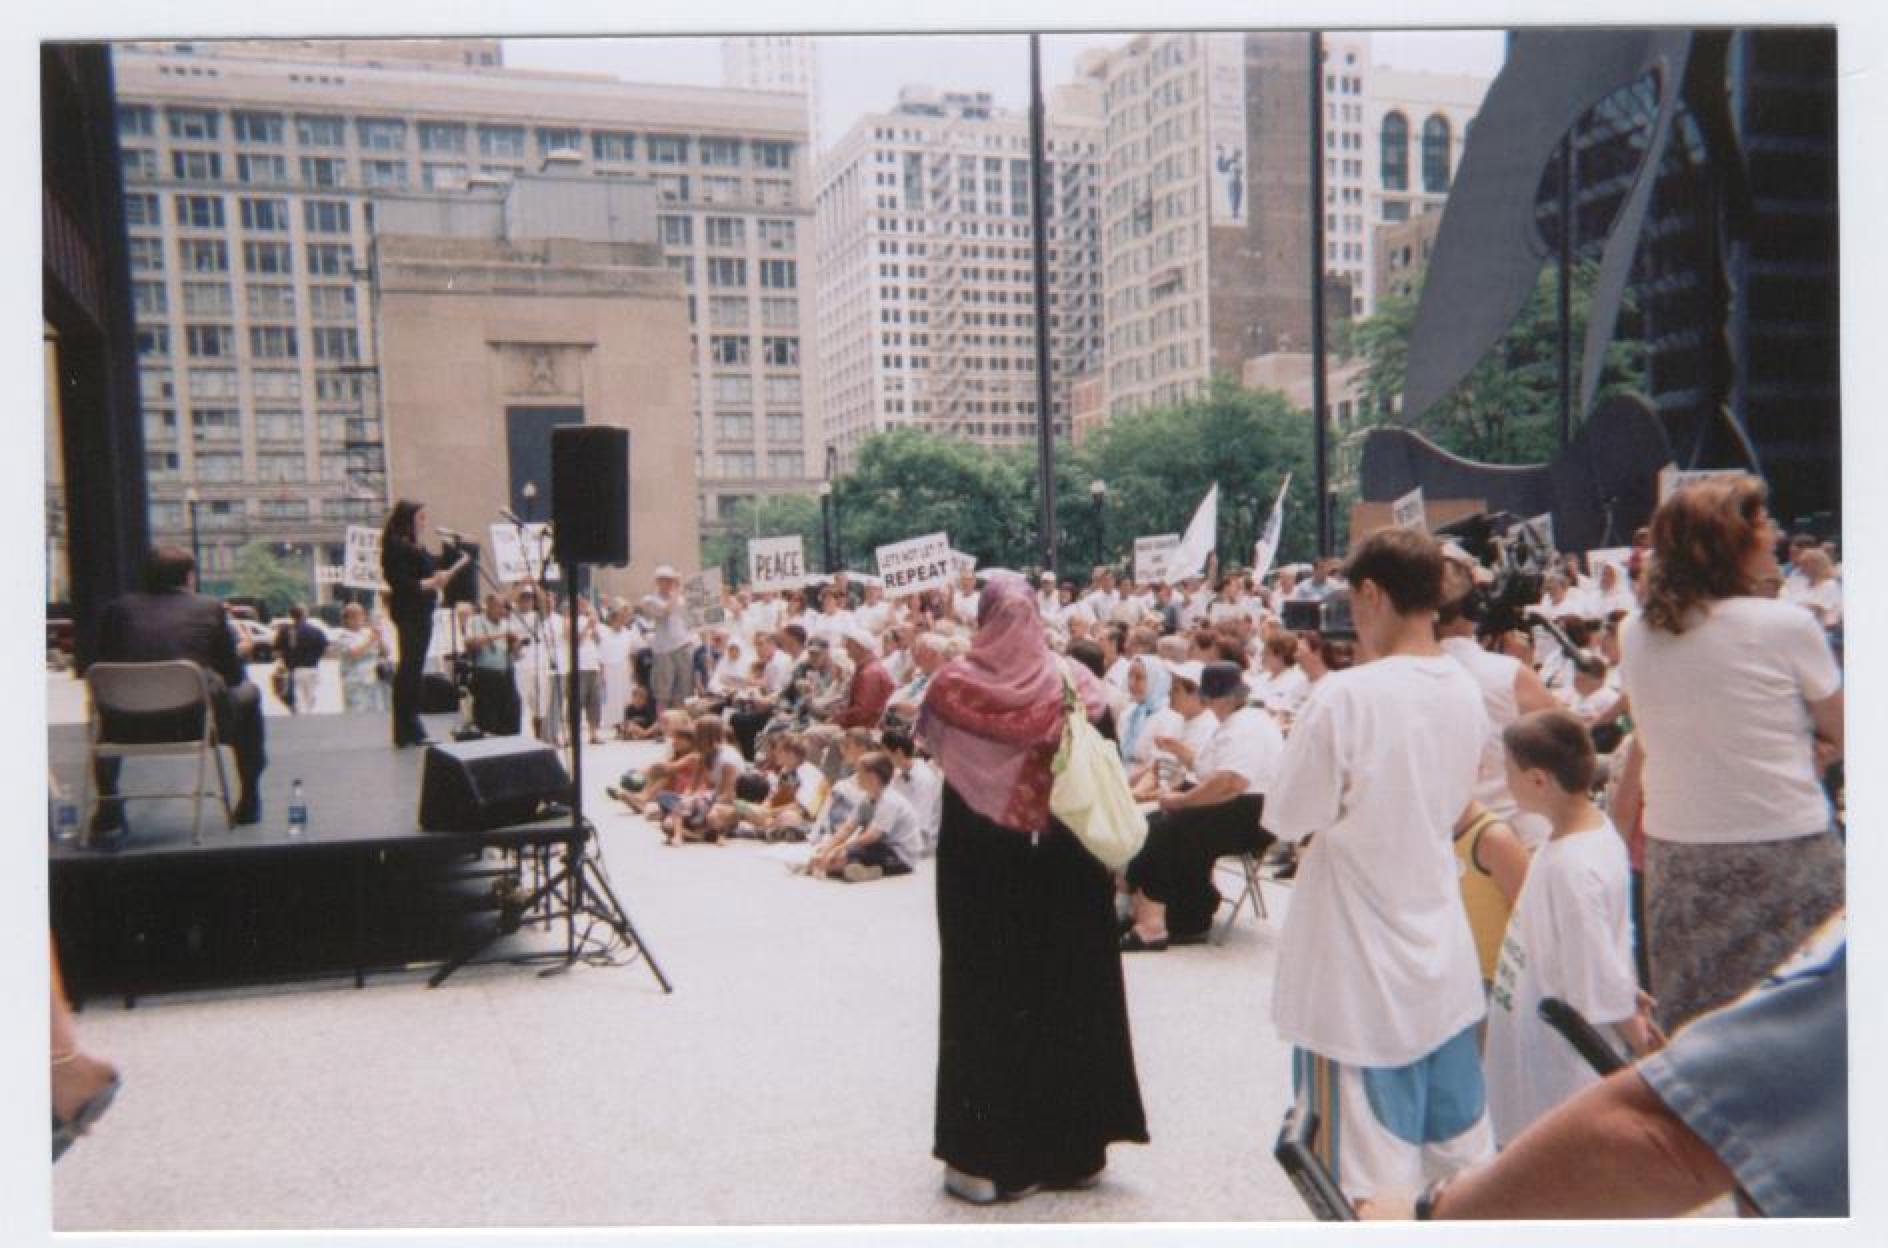 Ten-year memorial of Srebrenica massacres at Daley Plaza in Chicago, 2005.Photo credit: A. Croegaert